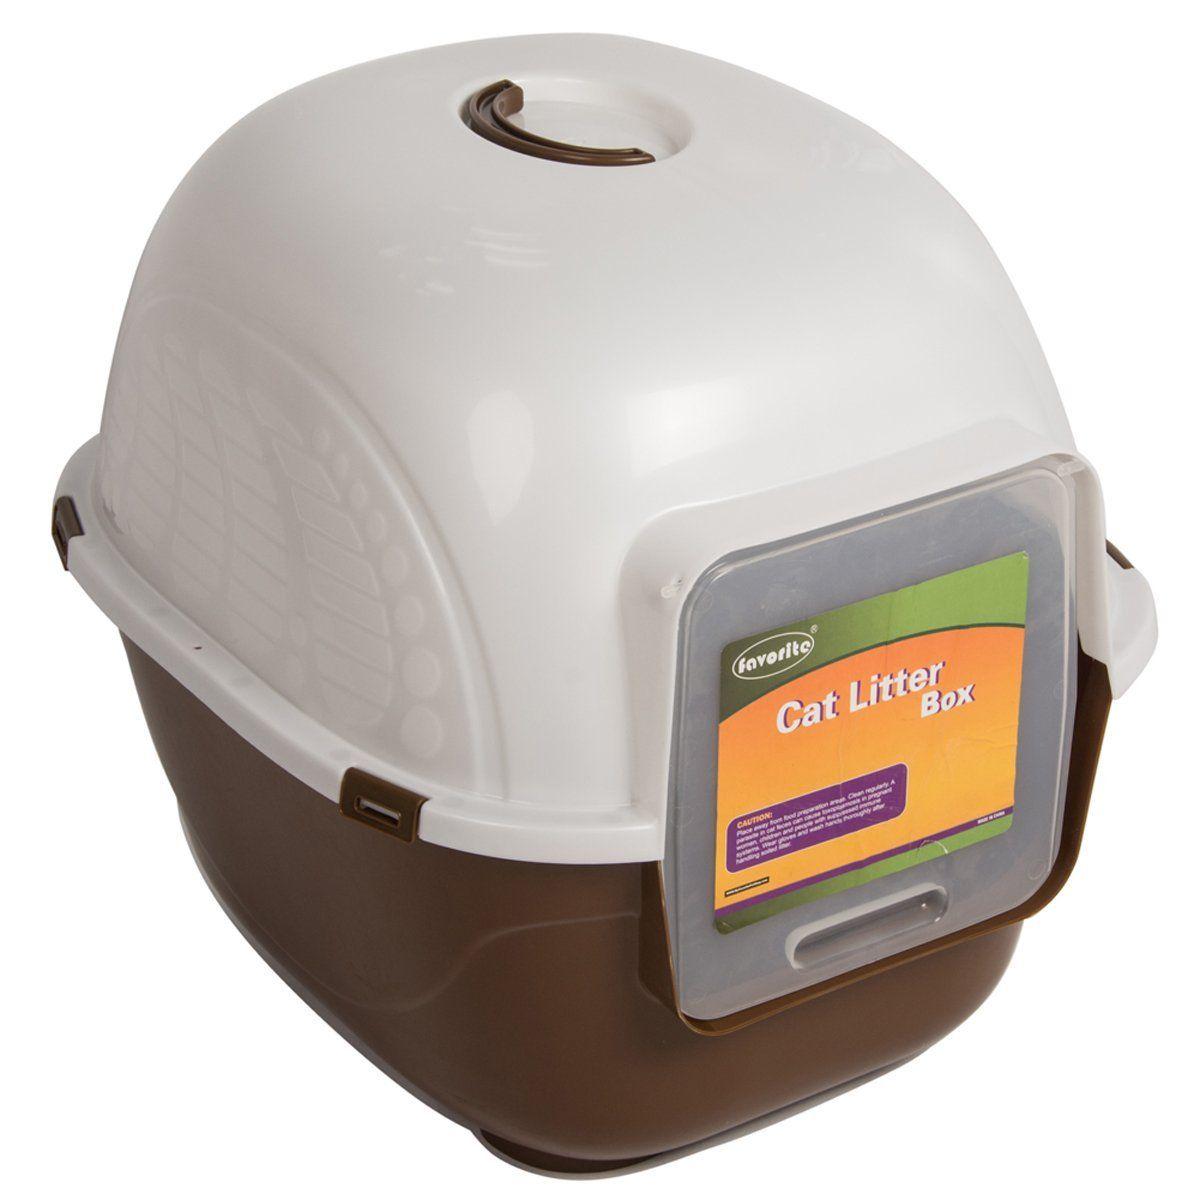 Favorite Portable Side Enter Covered Cat Litter Box, 2